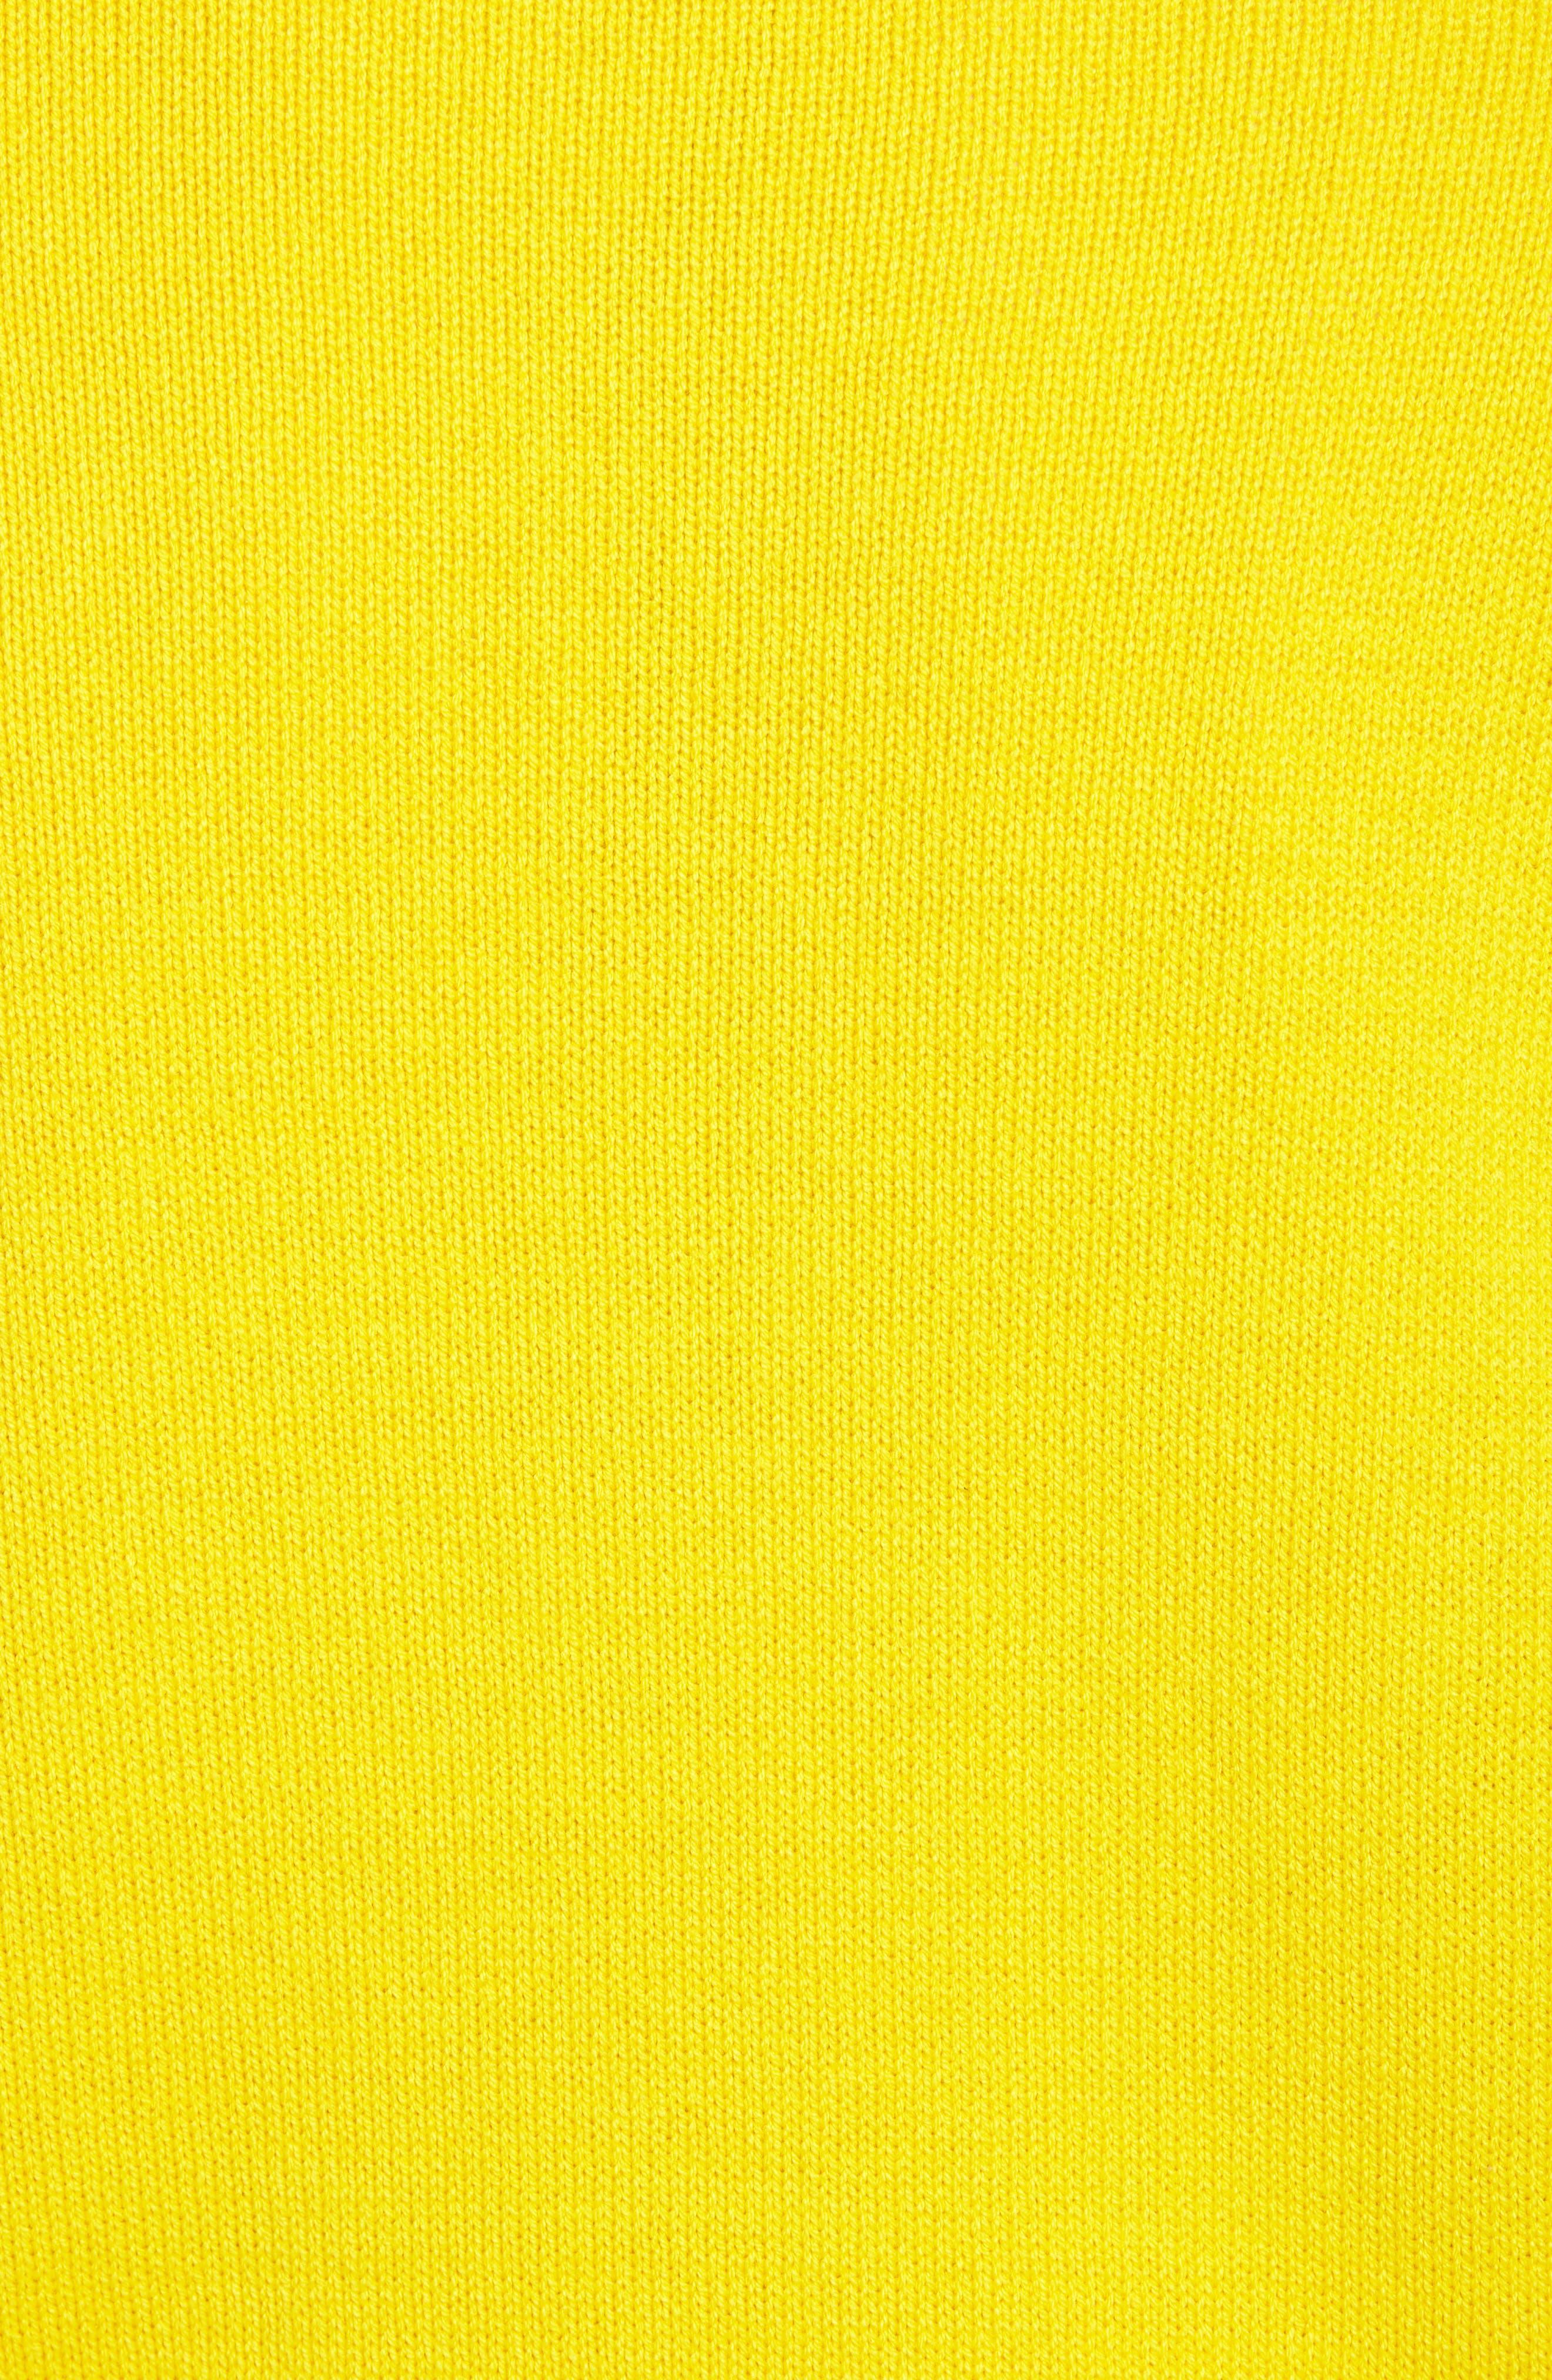 Crewneck Sweater,                             Alternate thumbnail 5, color,                             YELLOW SULPHUR